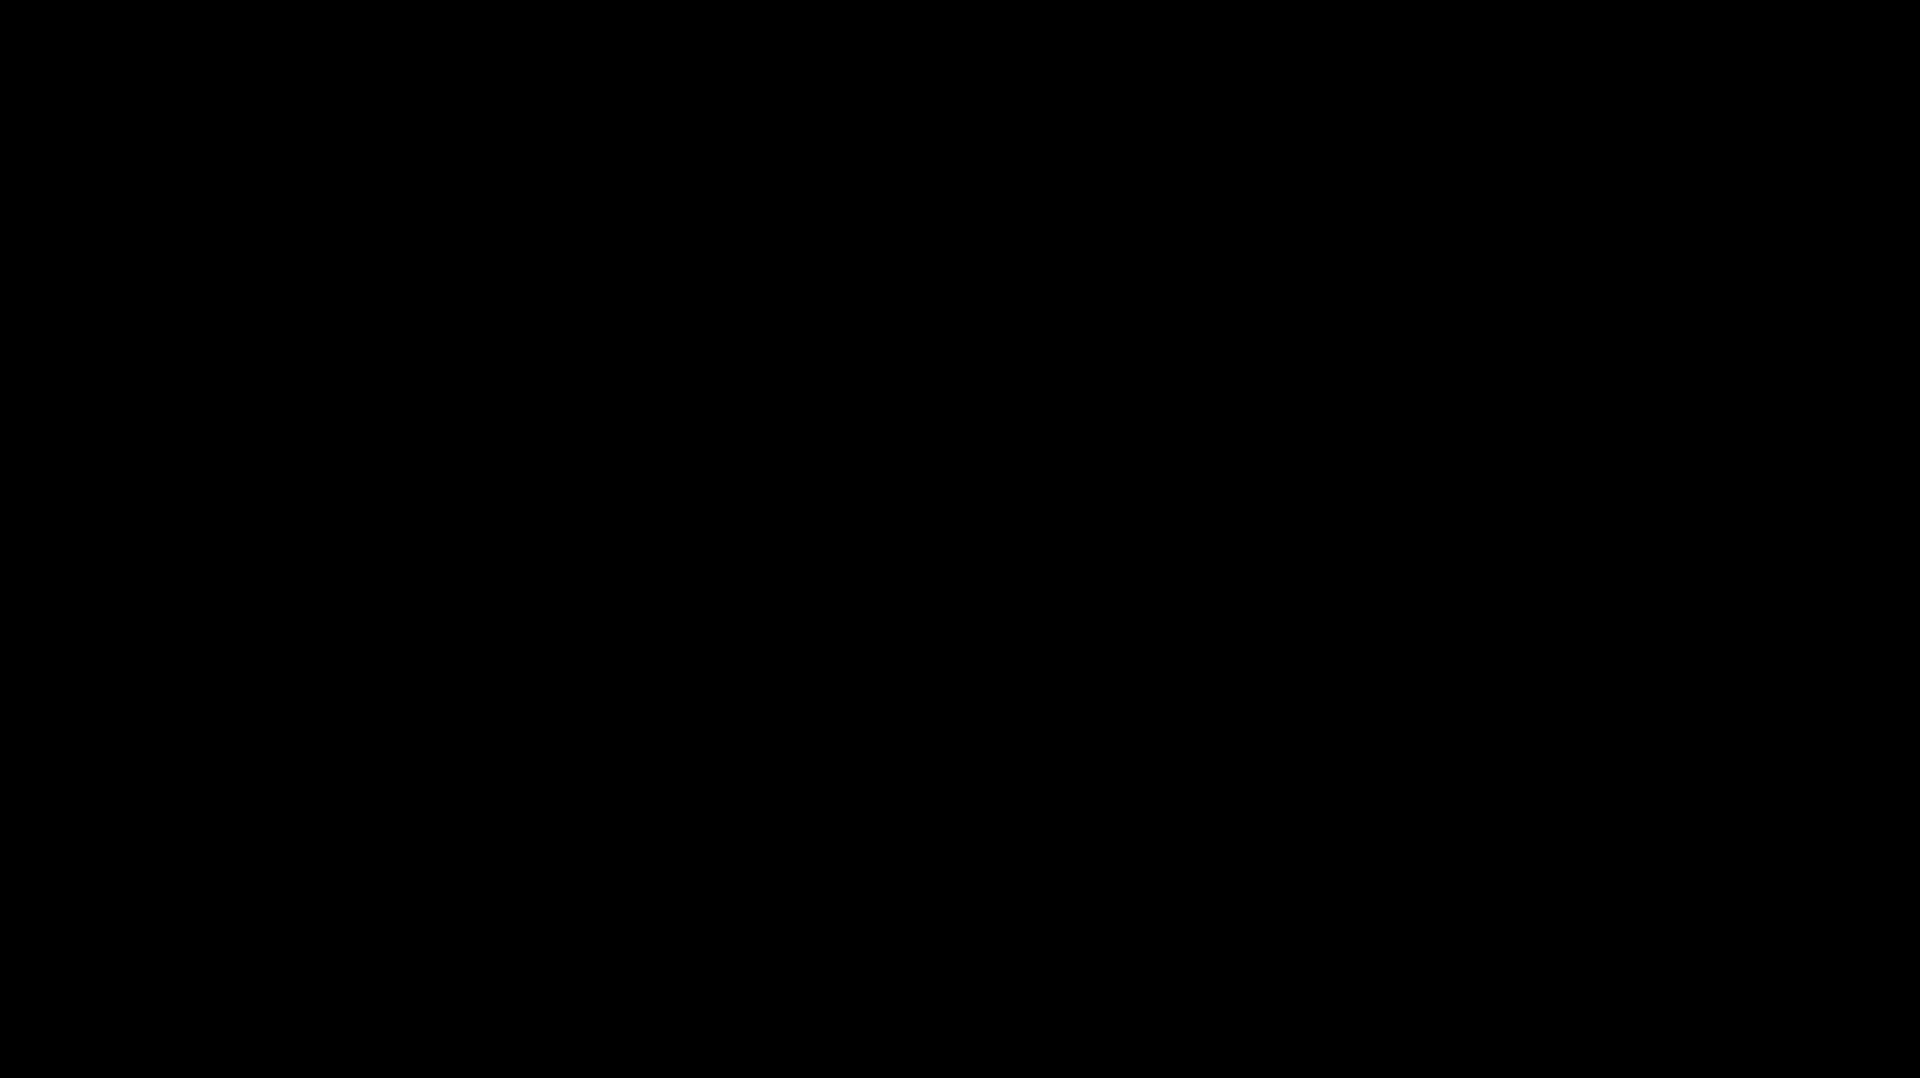 Universal_Studios_ logo black